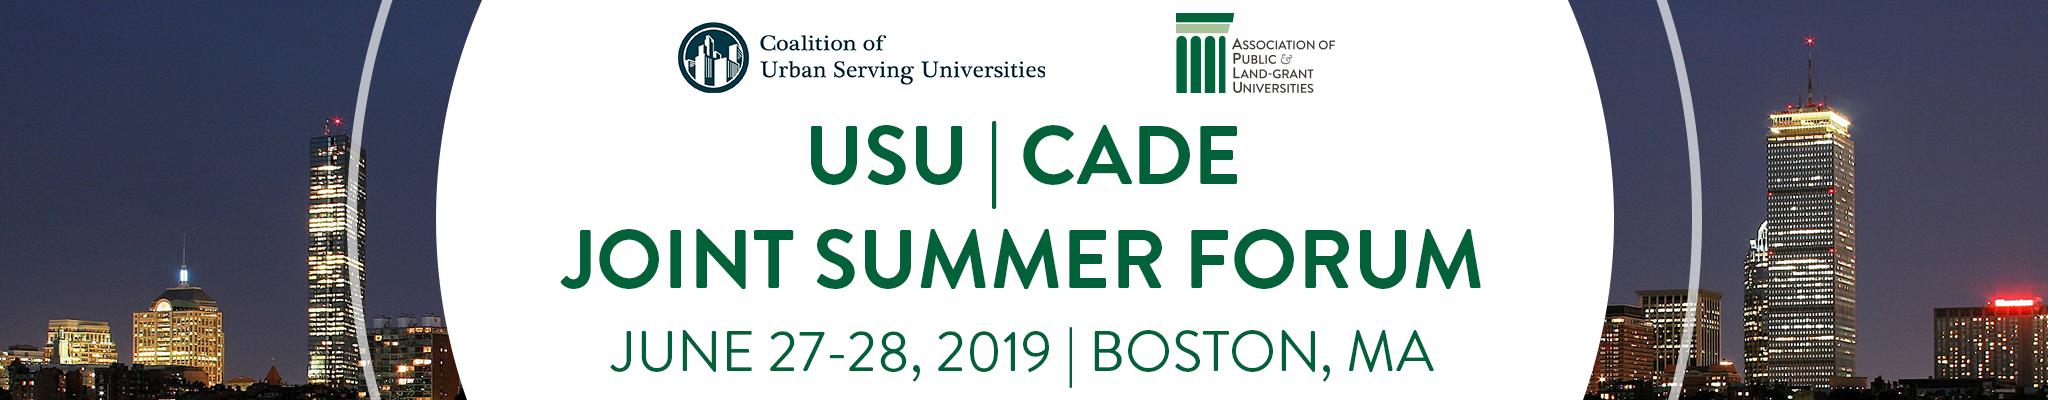 2019 USU & CADE Summer Forum